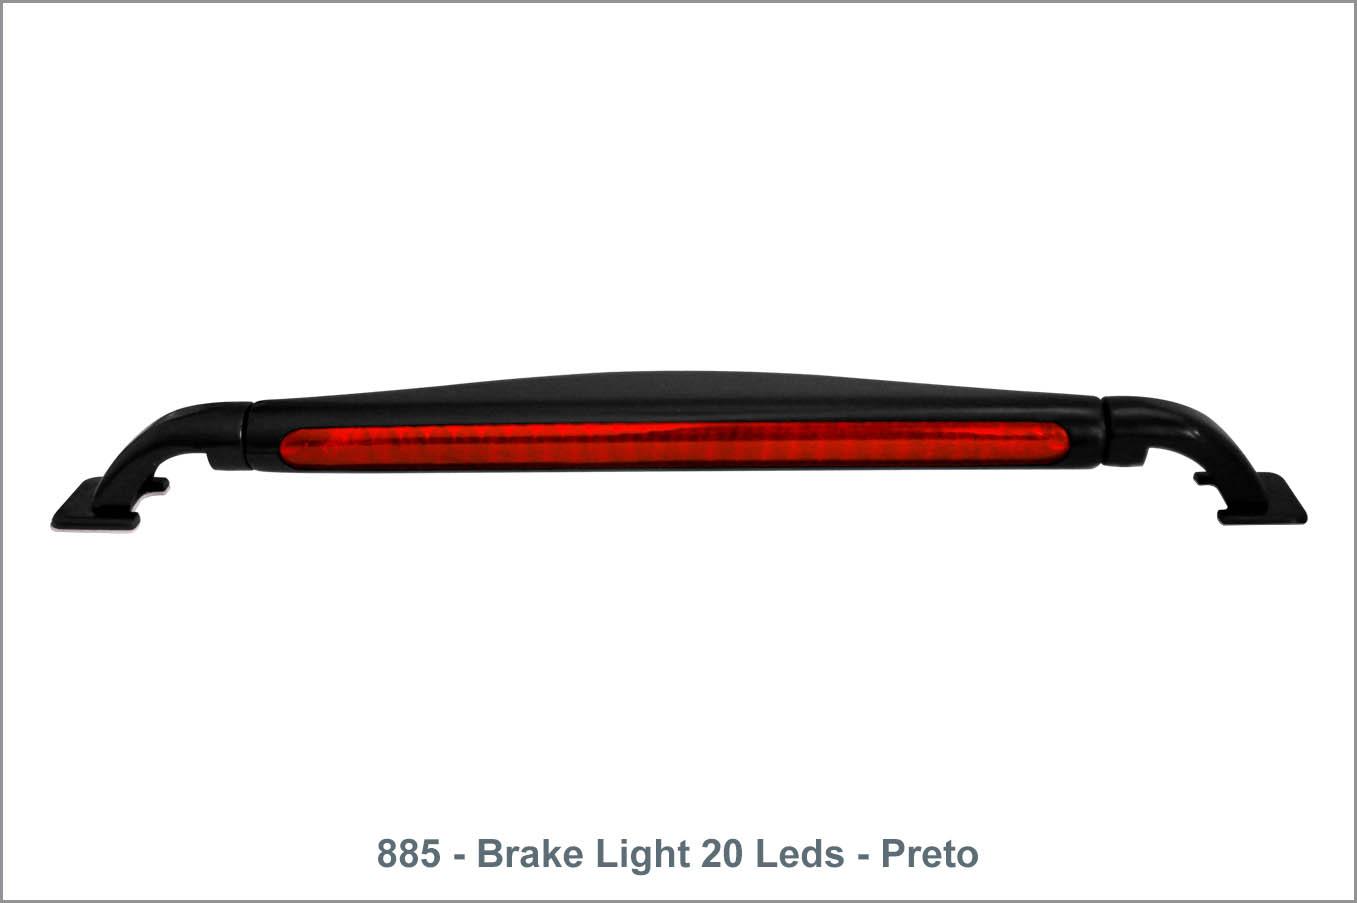 885 - Brake Light 20 Leds - Preto